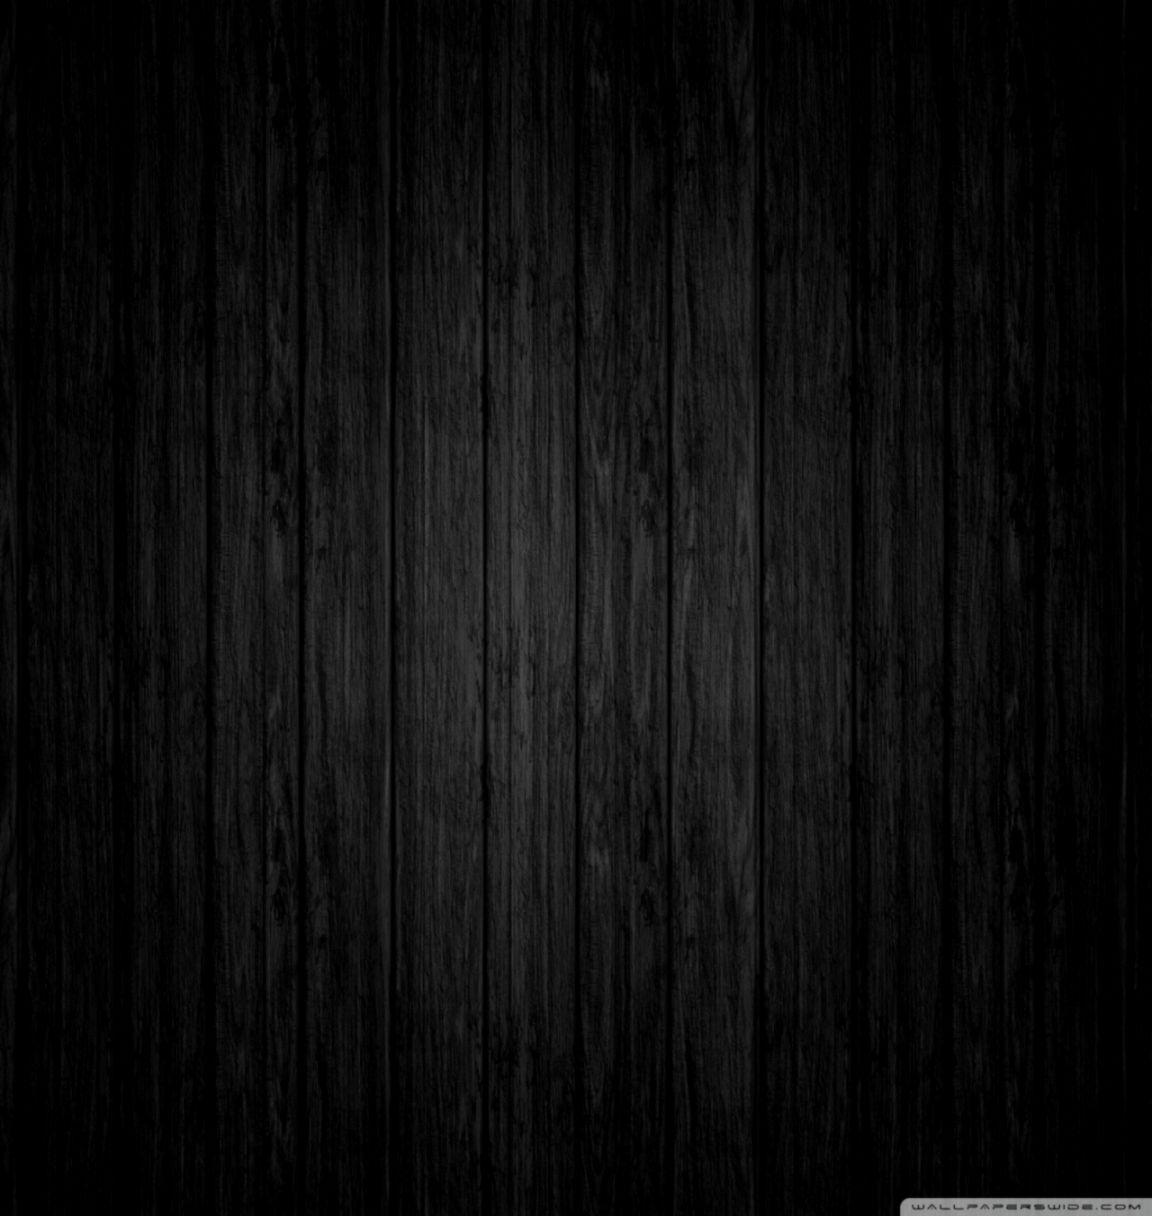 Dark Wood Wallpaper Android Wallpapers Memes